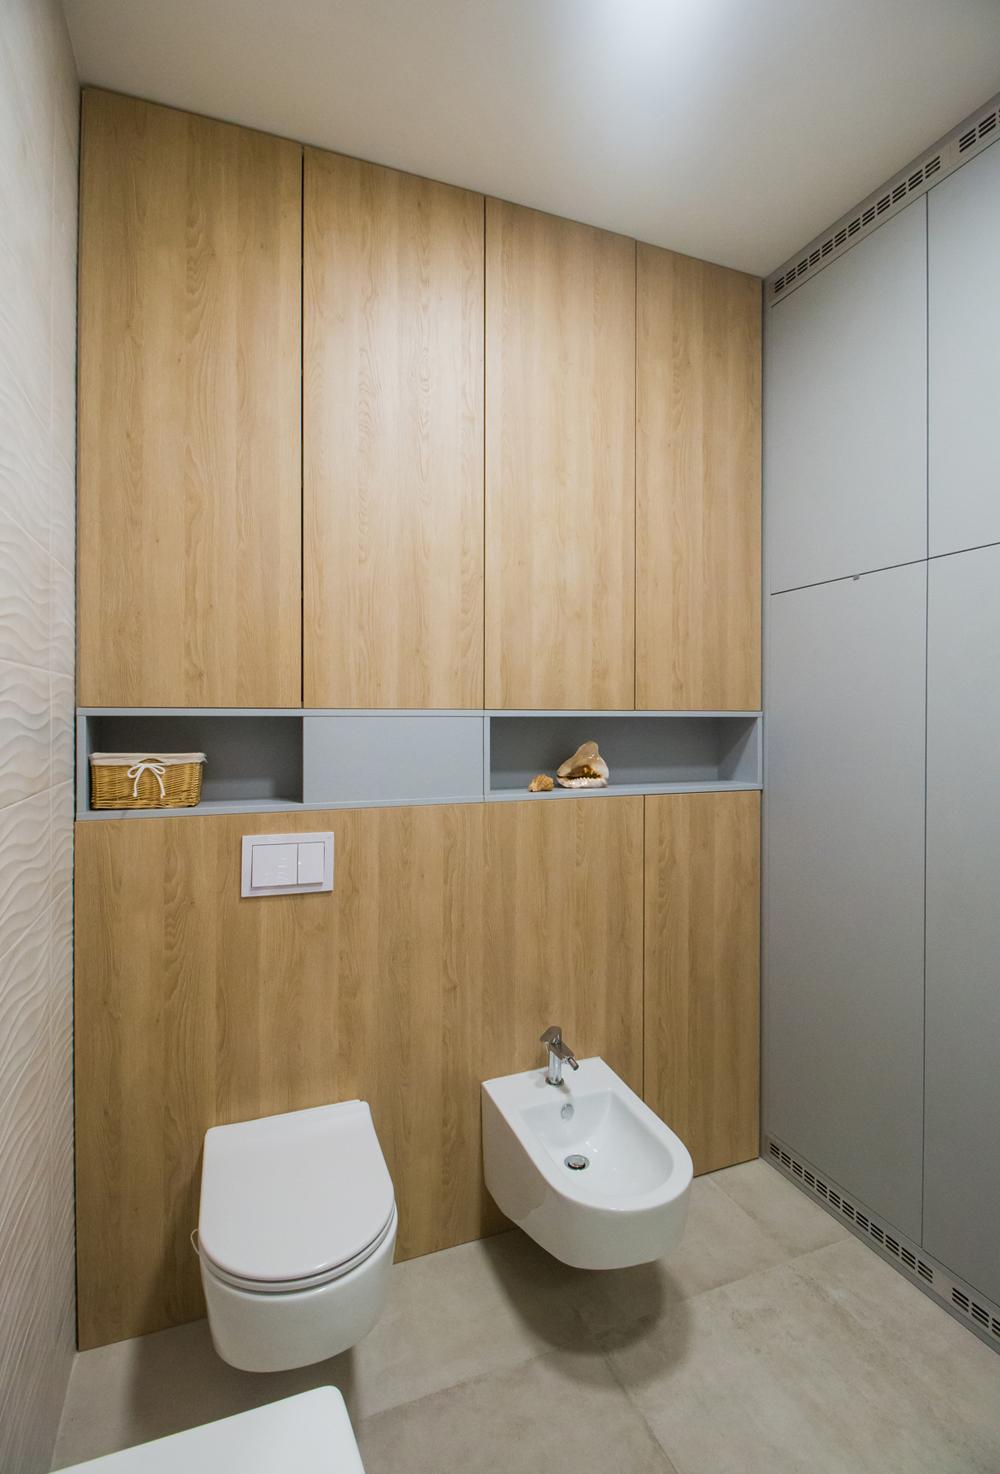 005-navrh-realizacia-kupelne-bratislava-pavlech-architekti